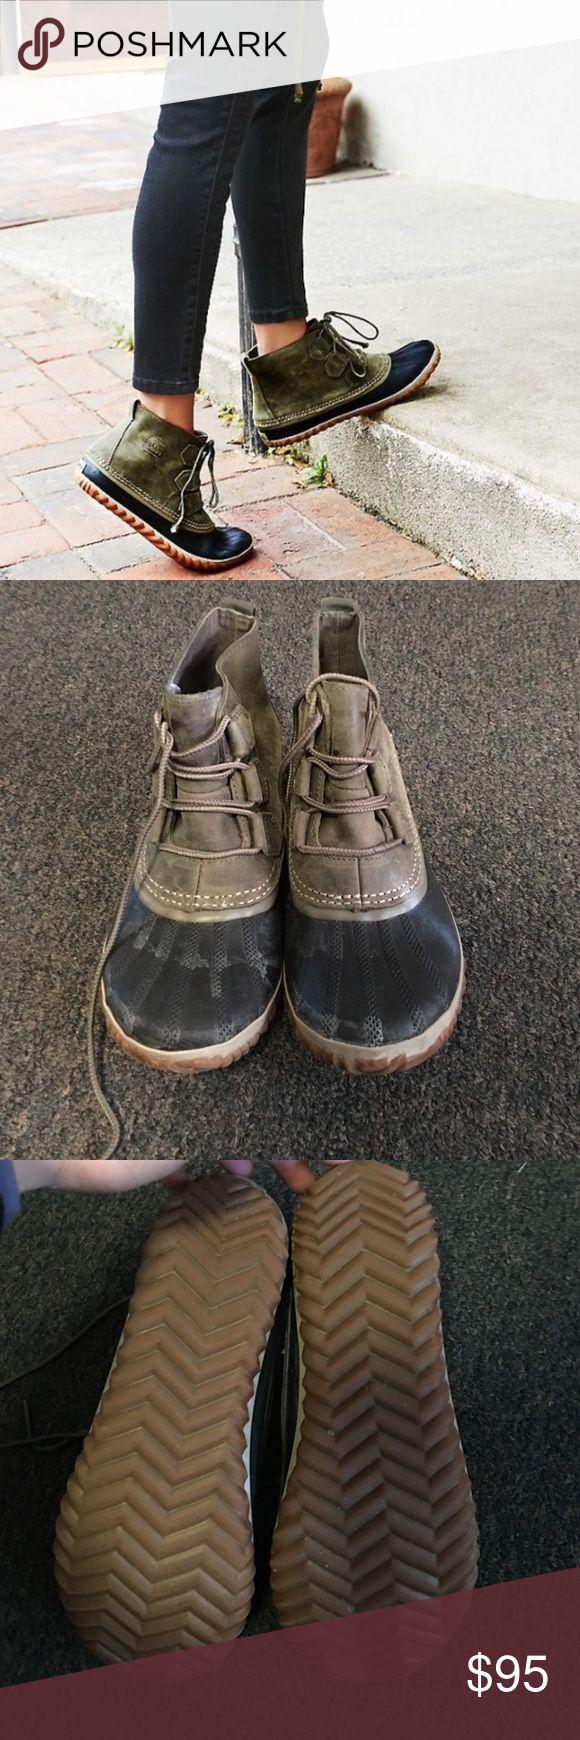 Shortie sorrel boot Only worn twice. Sorel Shoes Winter & Rain Boots